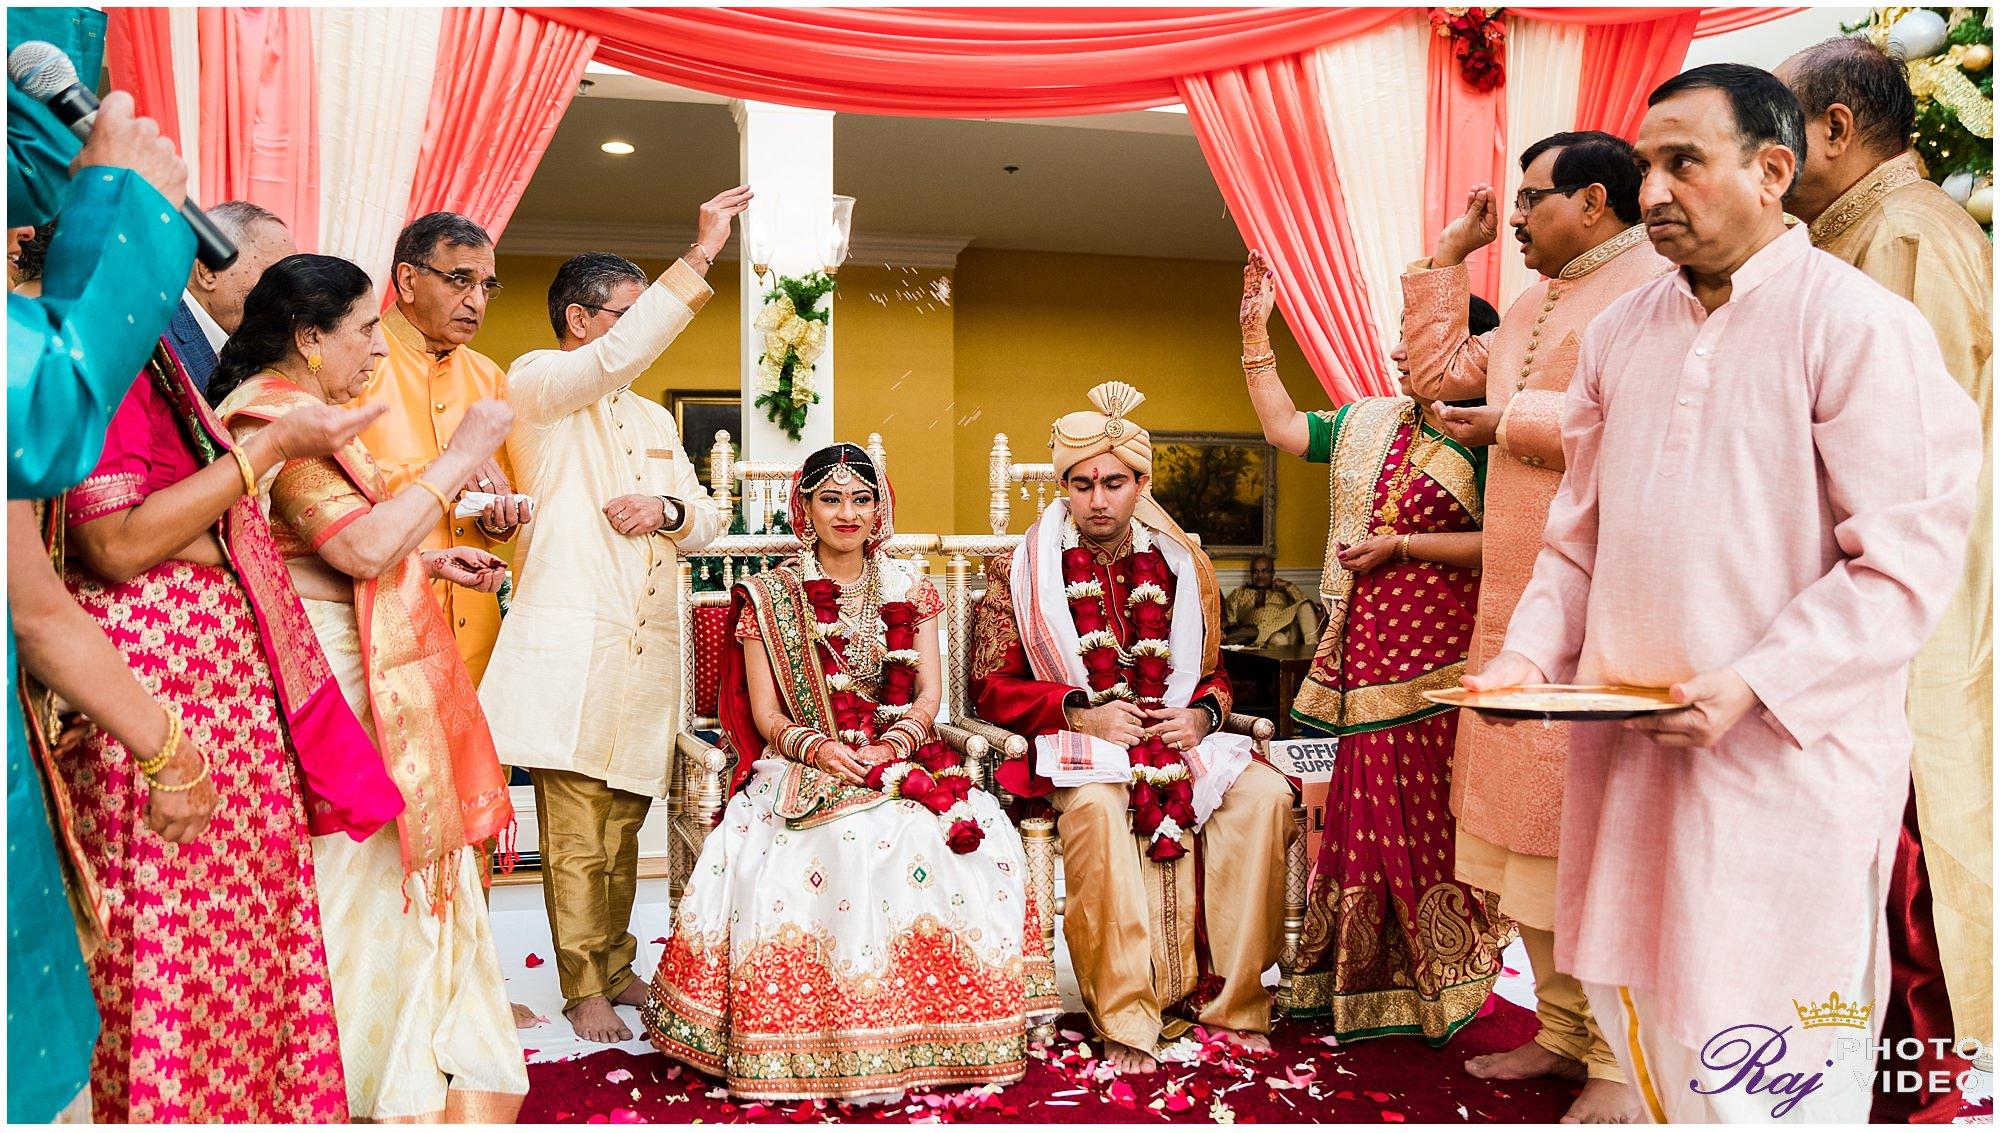 Founders-Inn-and-Spa-Virginia-Beach-VA-Indian-Wedding-Harini-Vivek-49.jpg